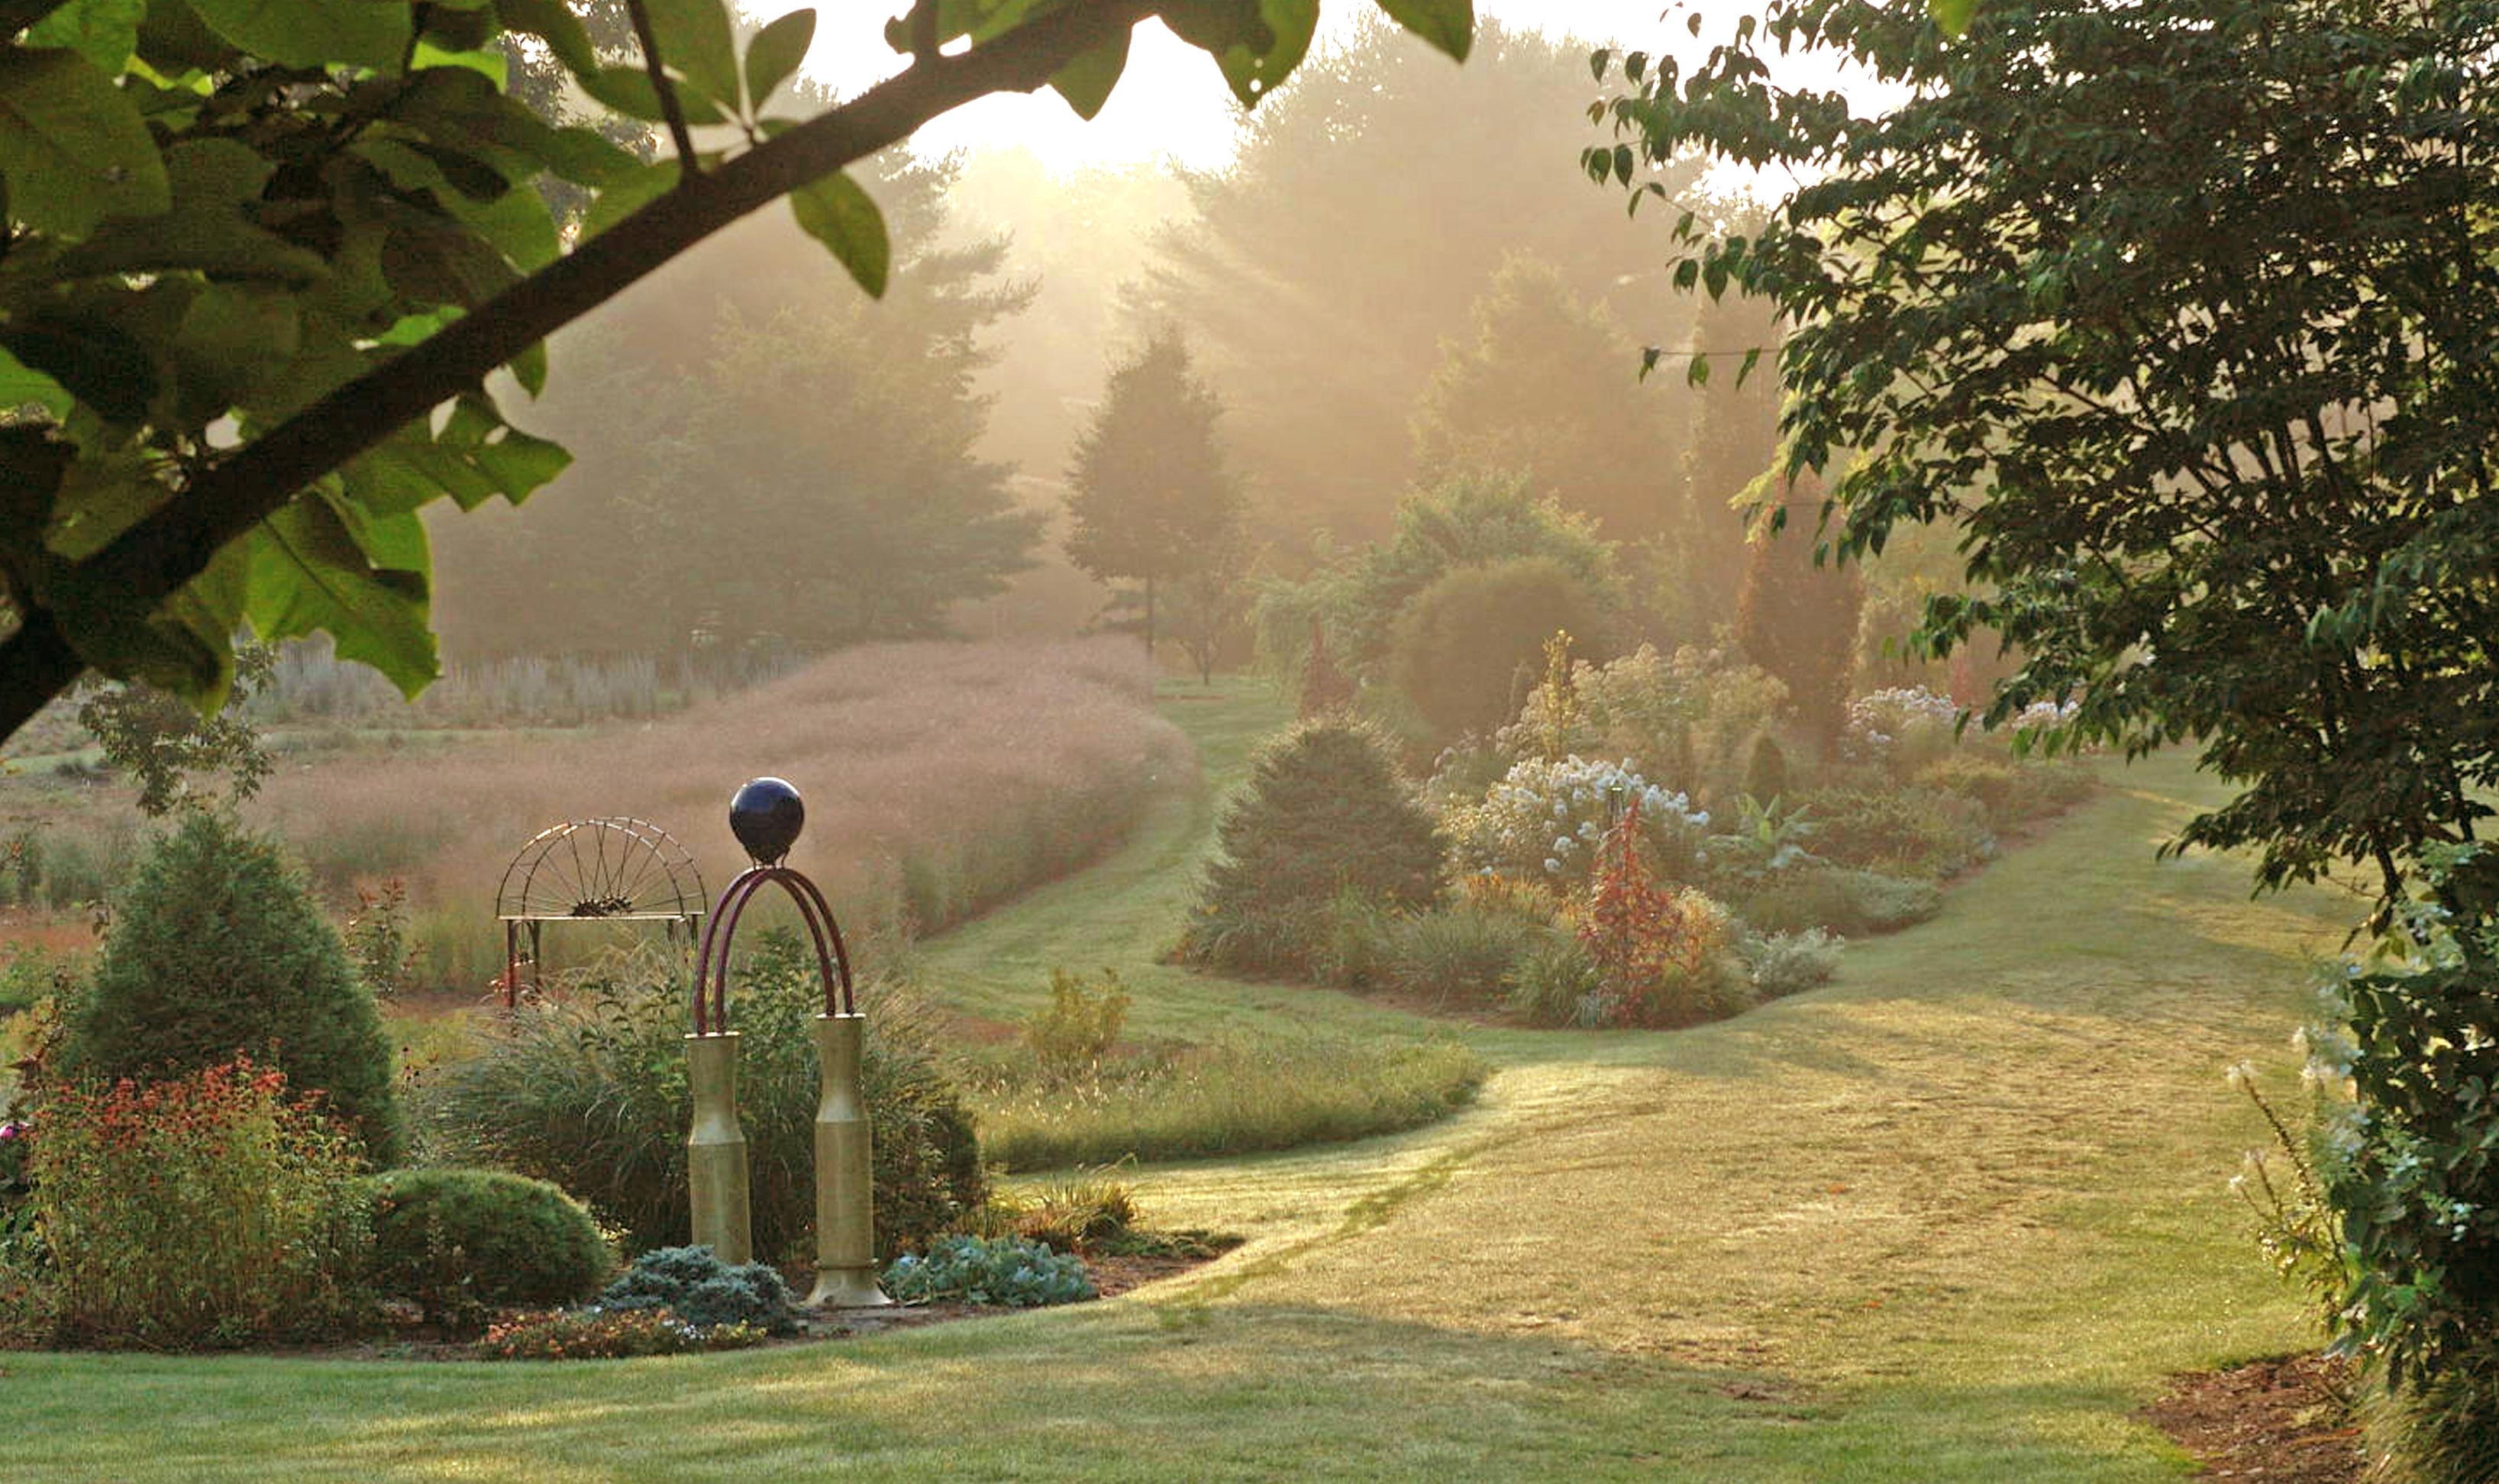 Misty garden photo